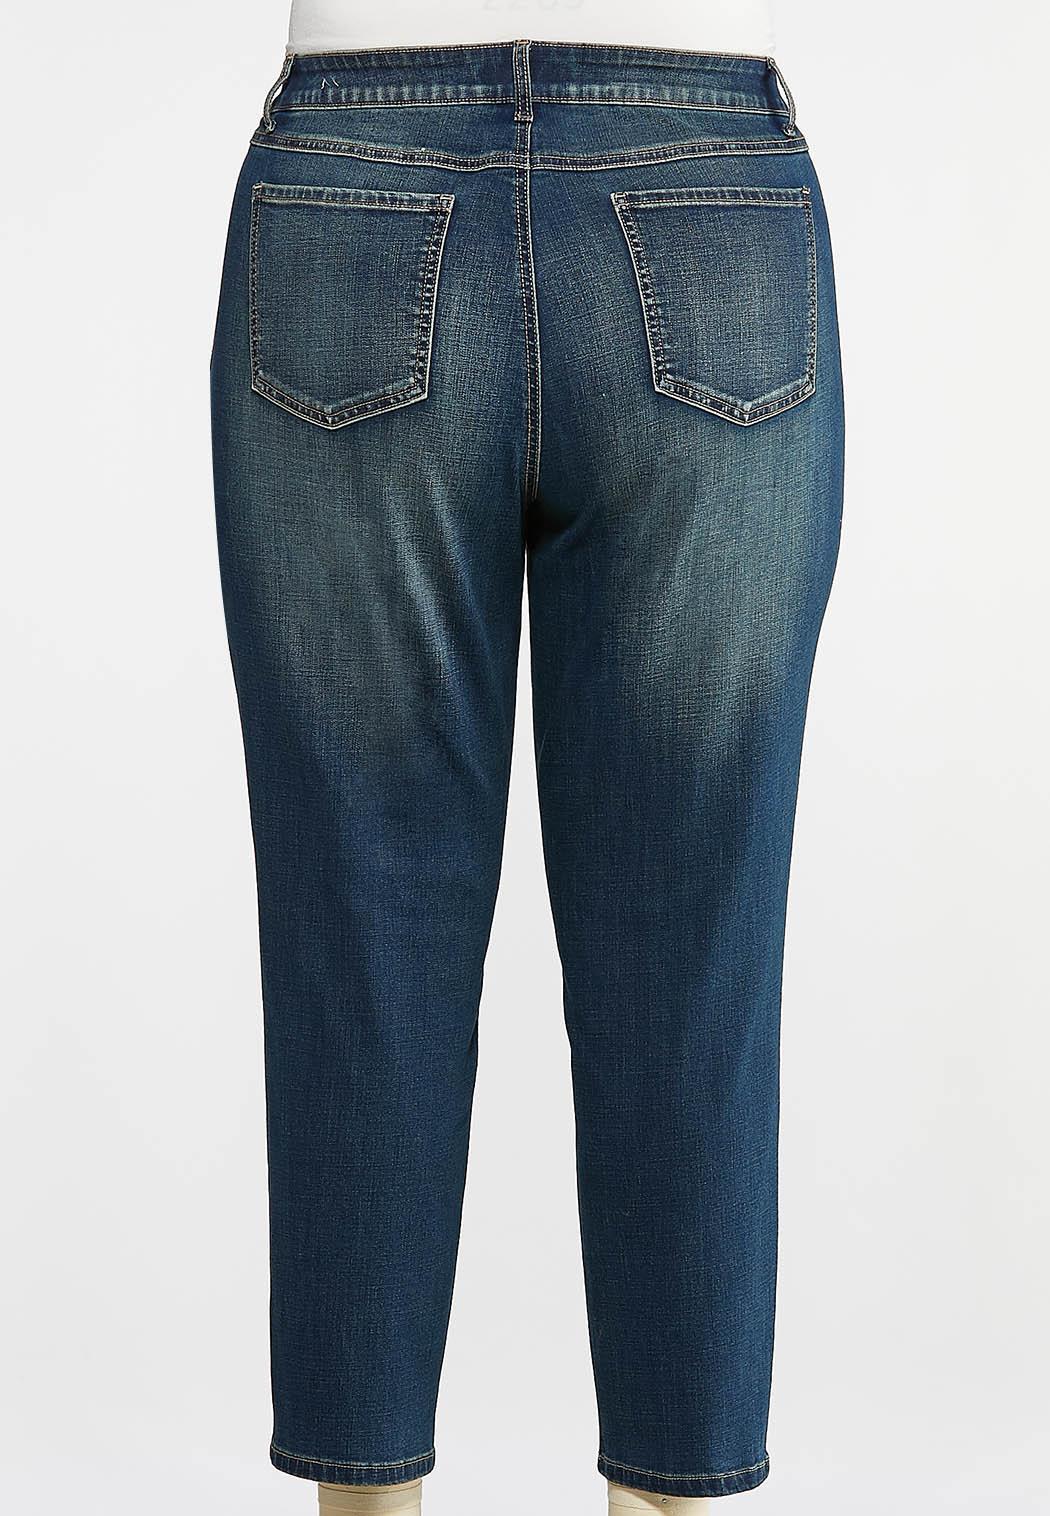 Plus Size Girlfriend Ankle Jeans (Item #43966388)